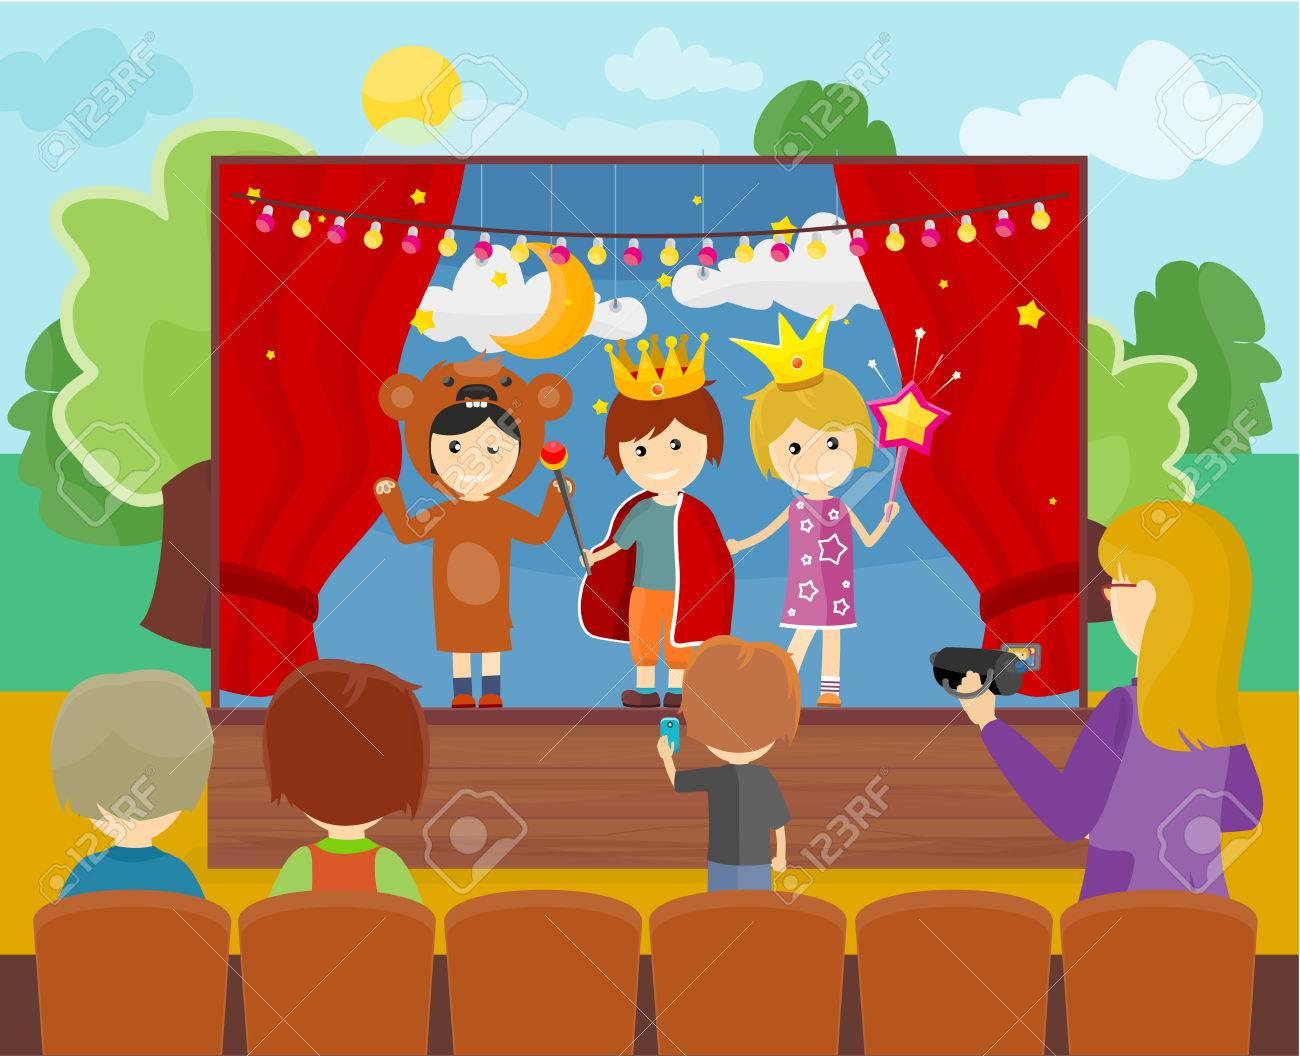 Theatre clipart school play.